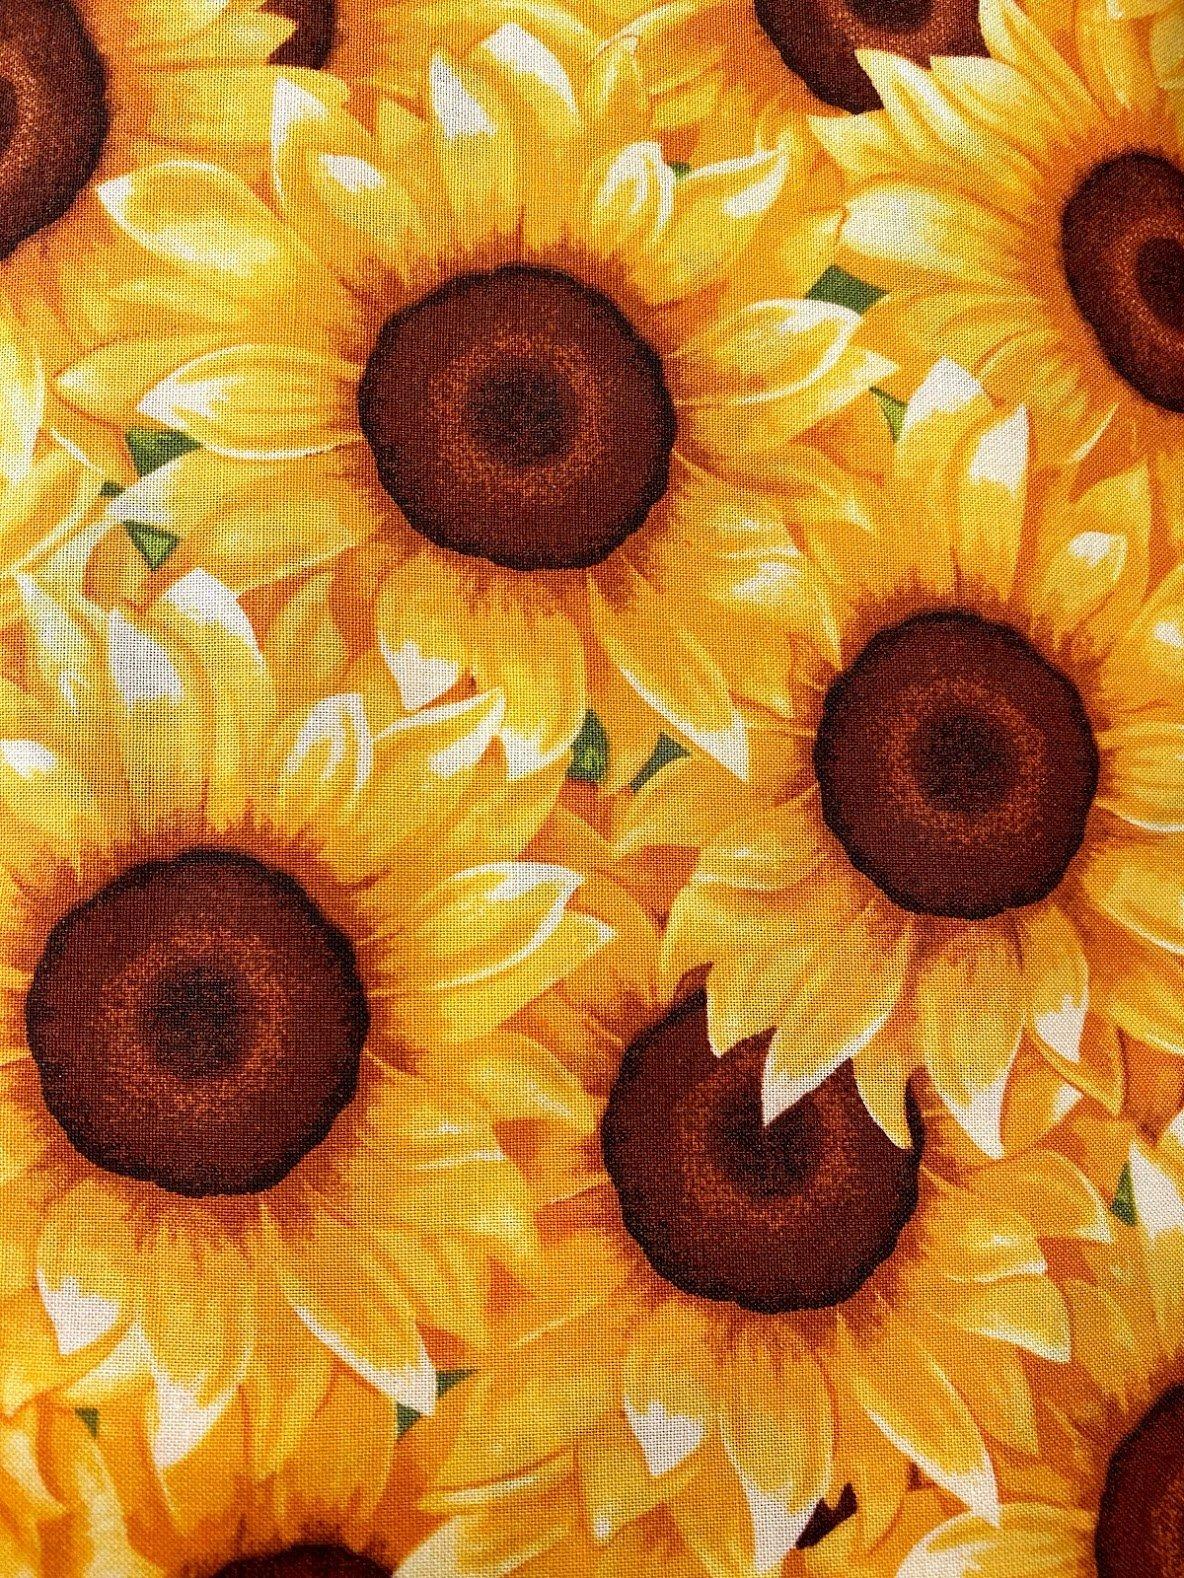 Sunny Sunflowers 5570-44